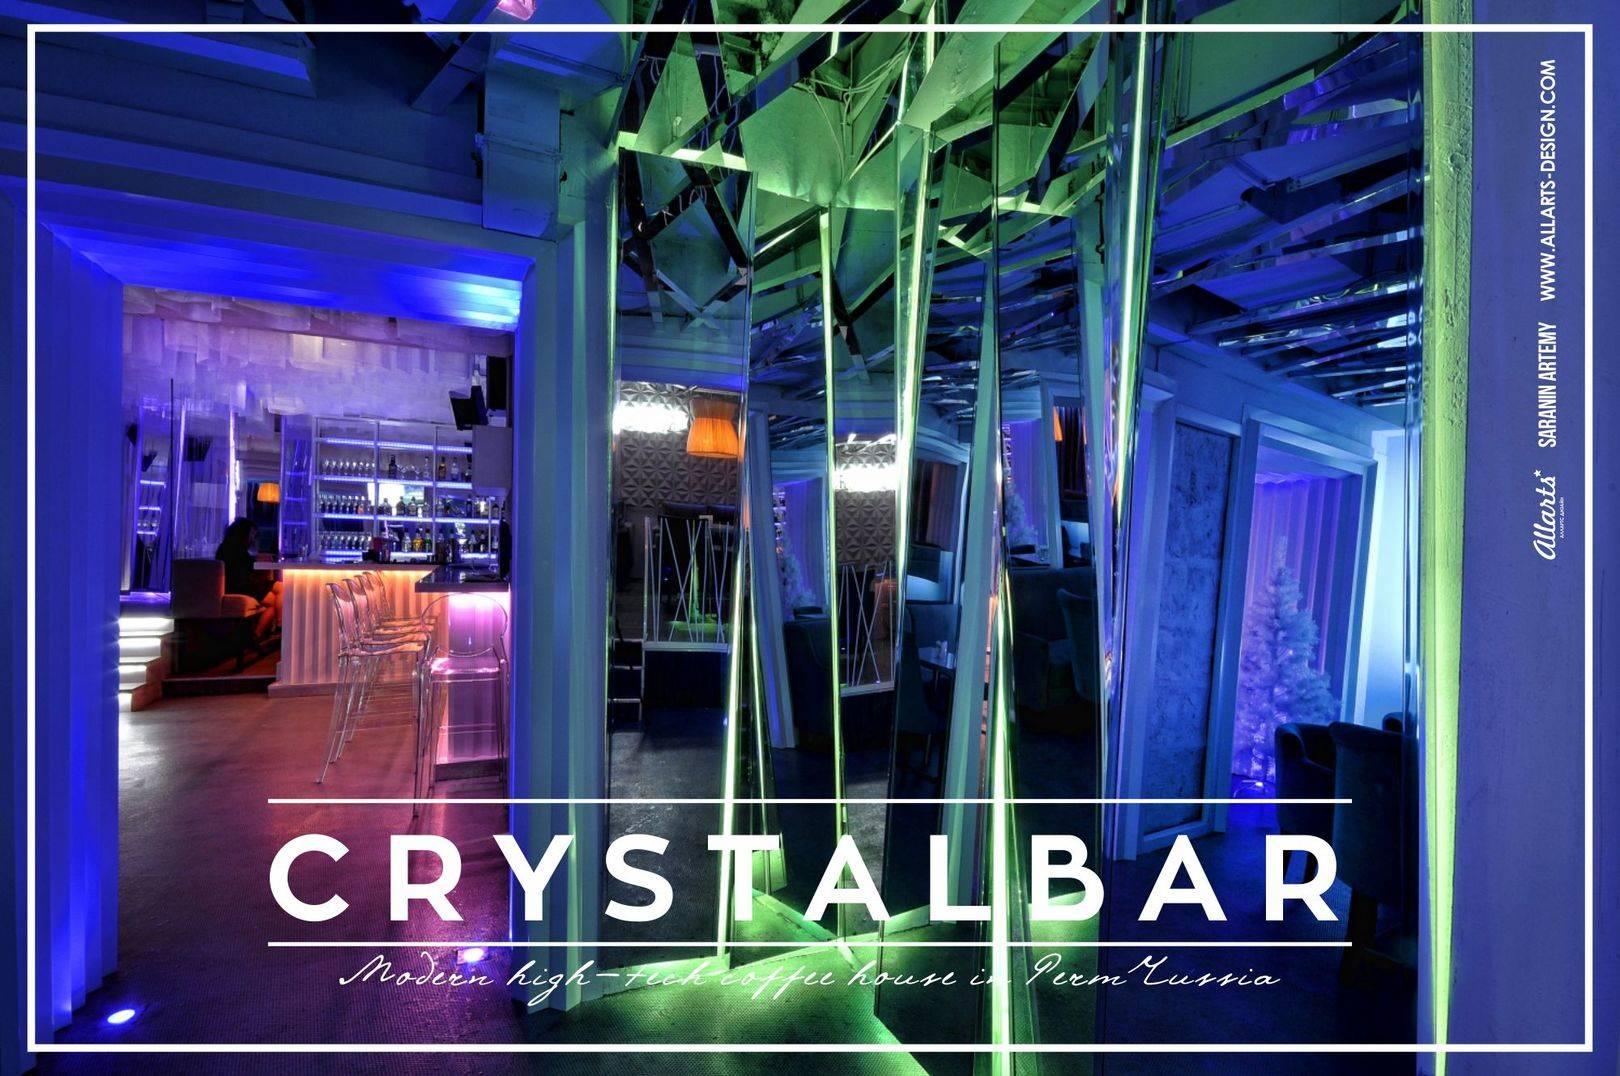 Дизайн интерьера зеркального Crystalbar